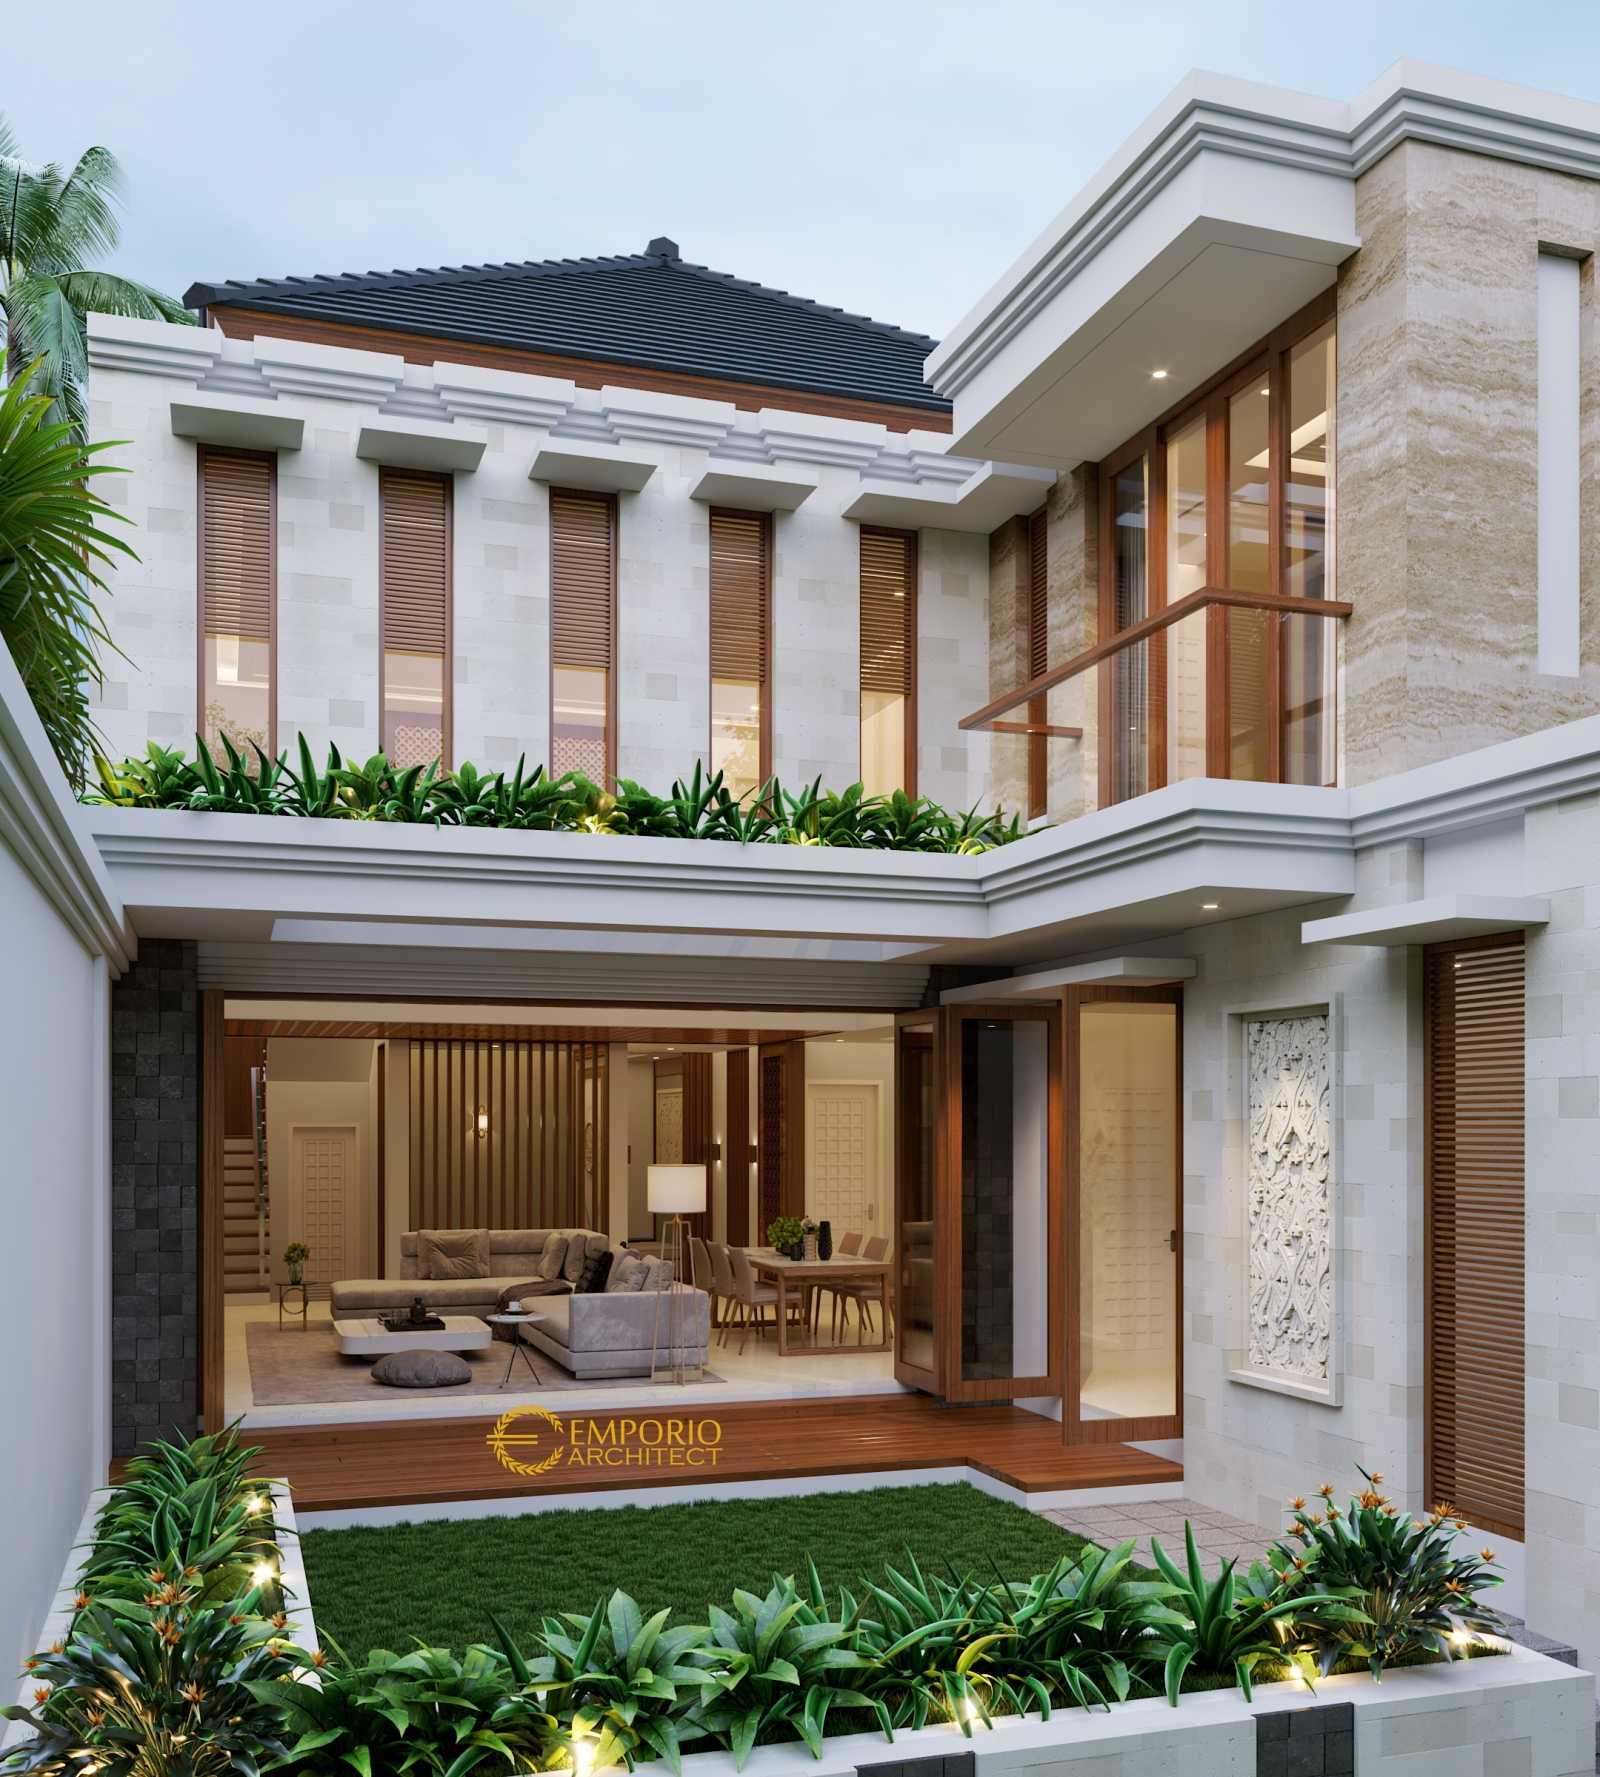 Emporio Architect Desain Rumah Villa Bali Tropis 609 @ Cikarang, Bekasi Cikarang, Bekasi, Jawa Barat, Indonesia Cikarang, Bekasi, Jawa Barat, Indonesia Emporio-Architect-Desain-Rumah-Villa-Bali-Tropis-609-Cikarang-Bekasi  77529